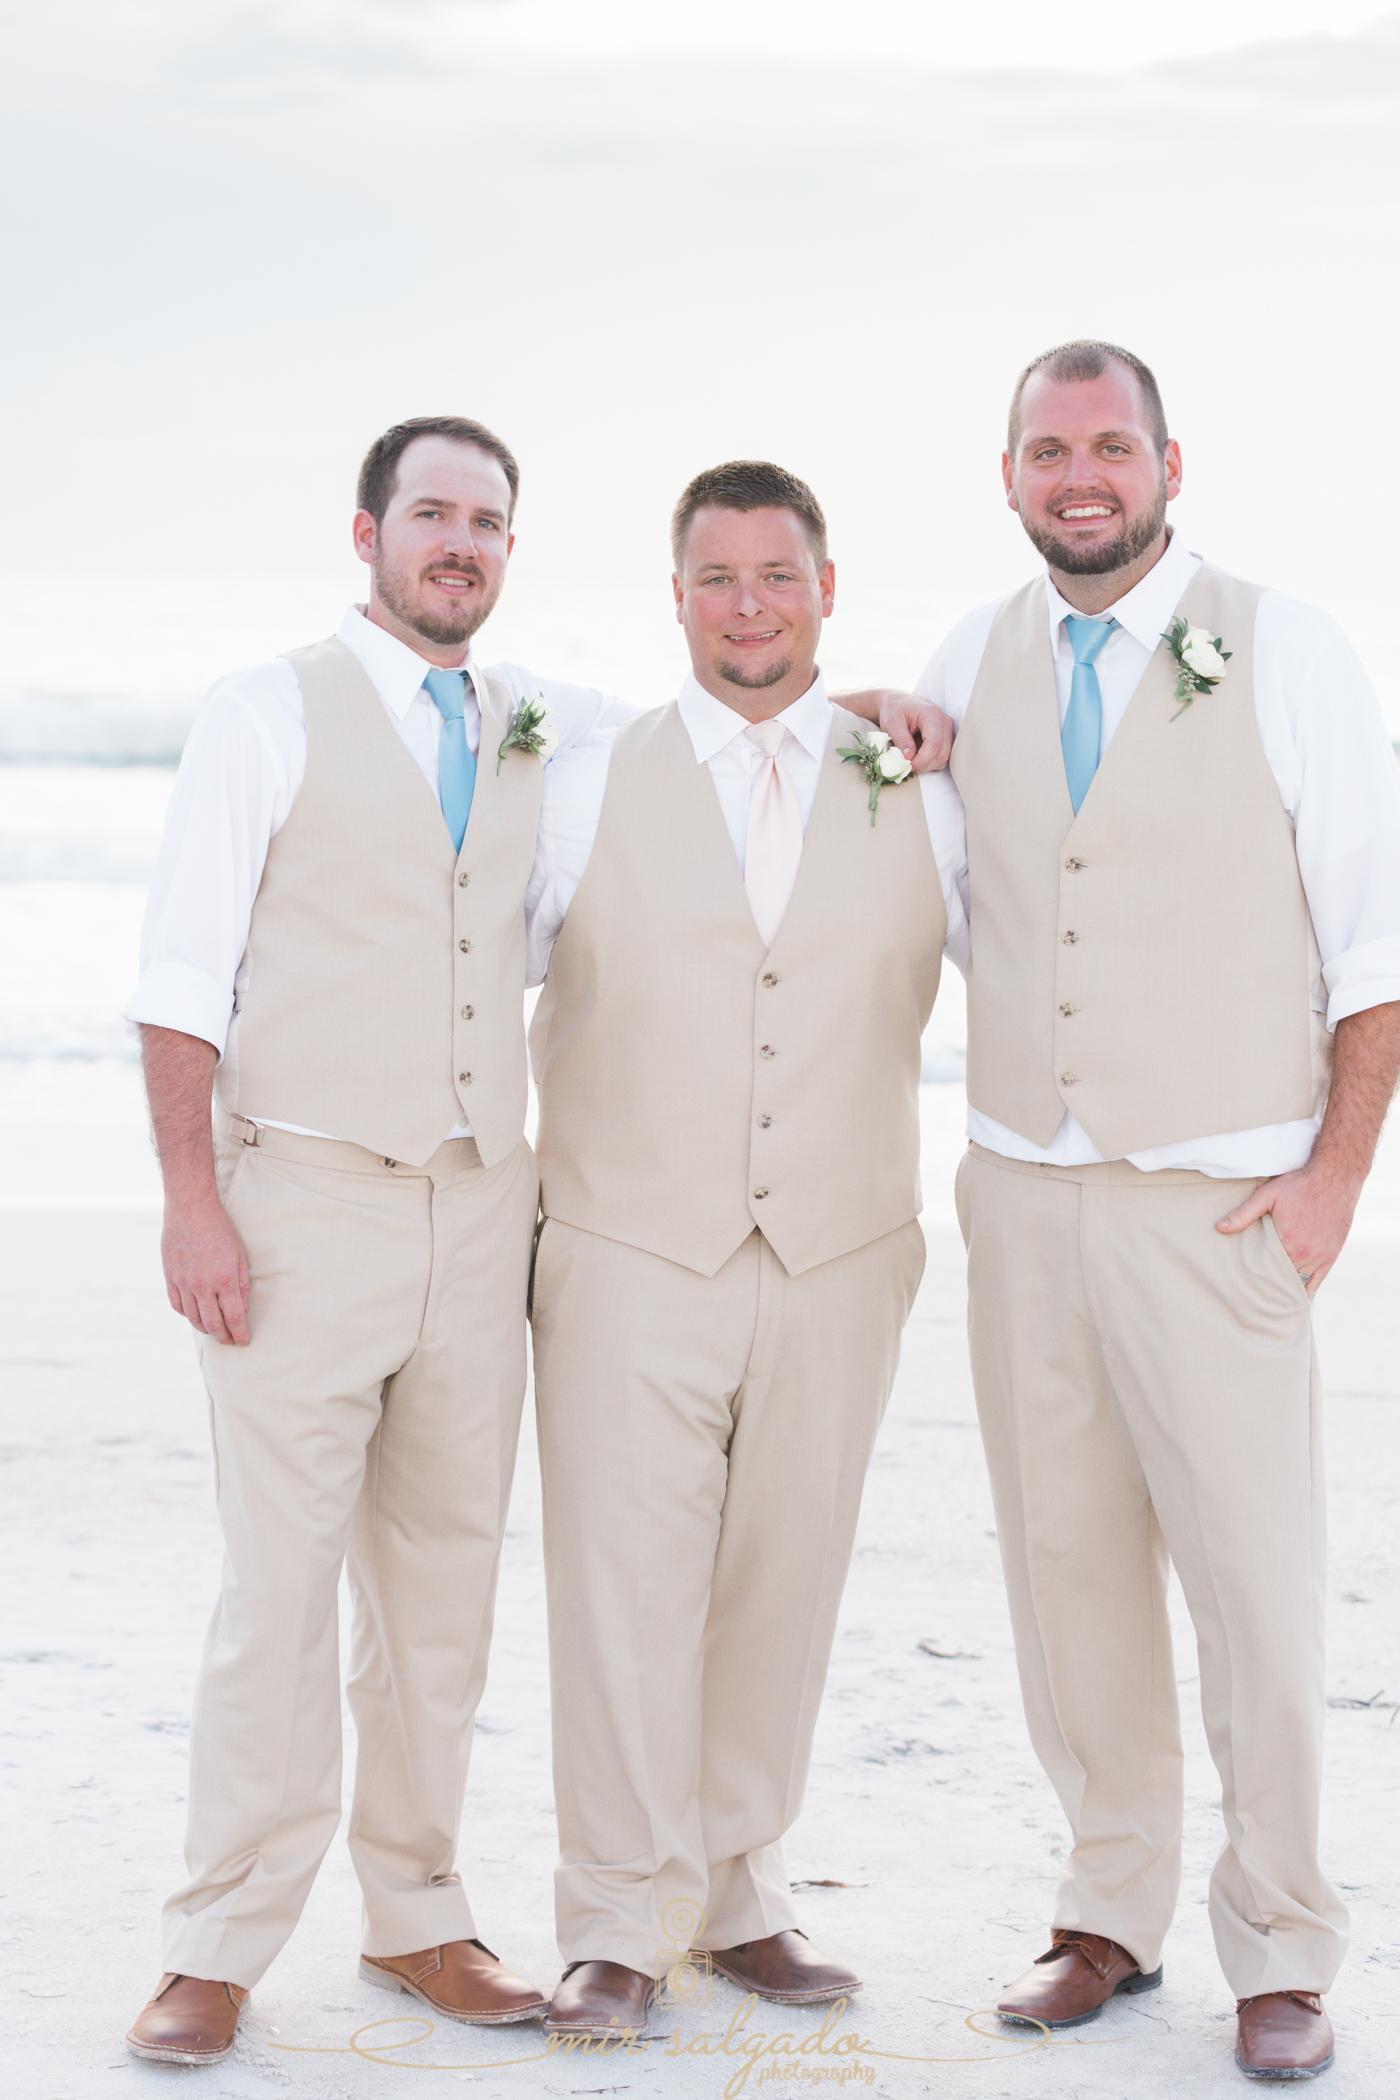 groom-and-groomsmen-wedding-photo, beach-wedding